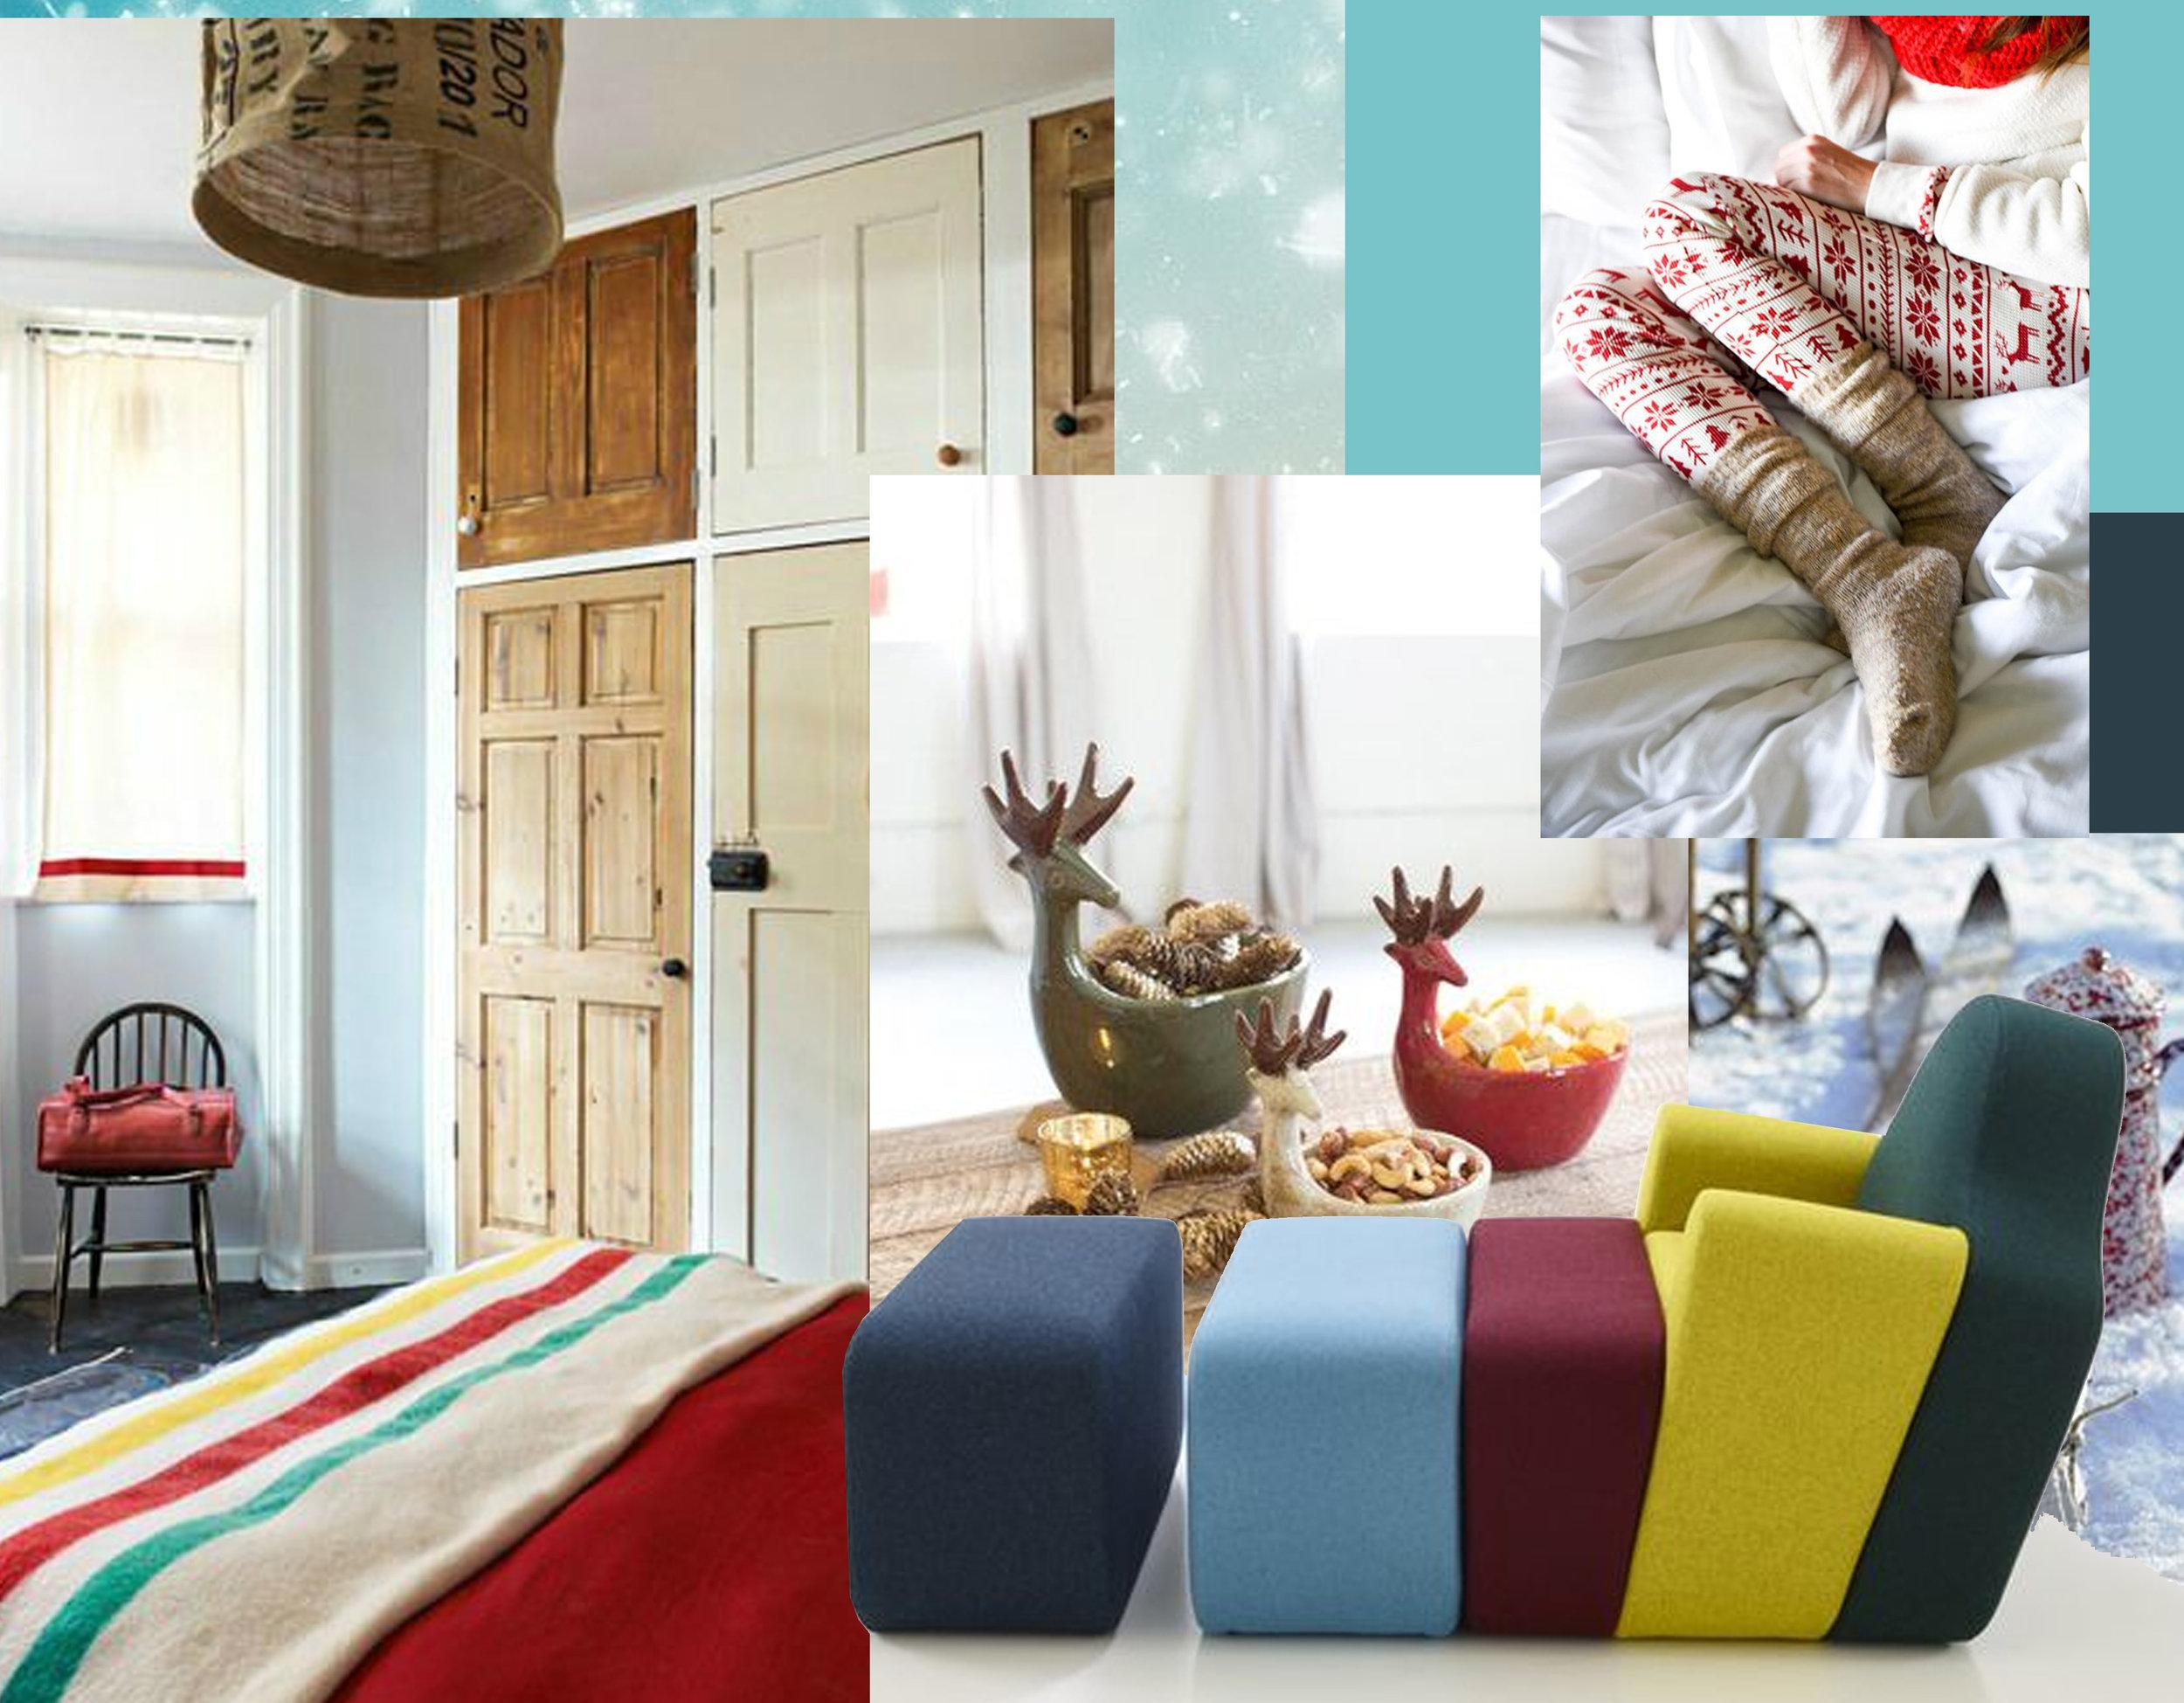 interior via  Decoholic  - Kalalou Ceramic Deer bowls  Mod.ish  - winter pajamas with traditional print  Sequins & Things  - armchair Slice  Pierre Charpin